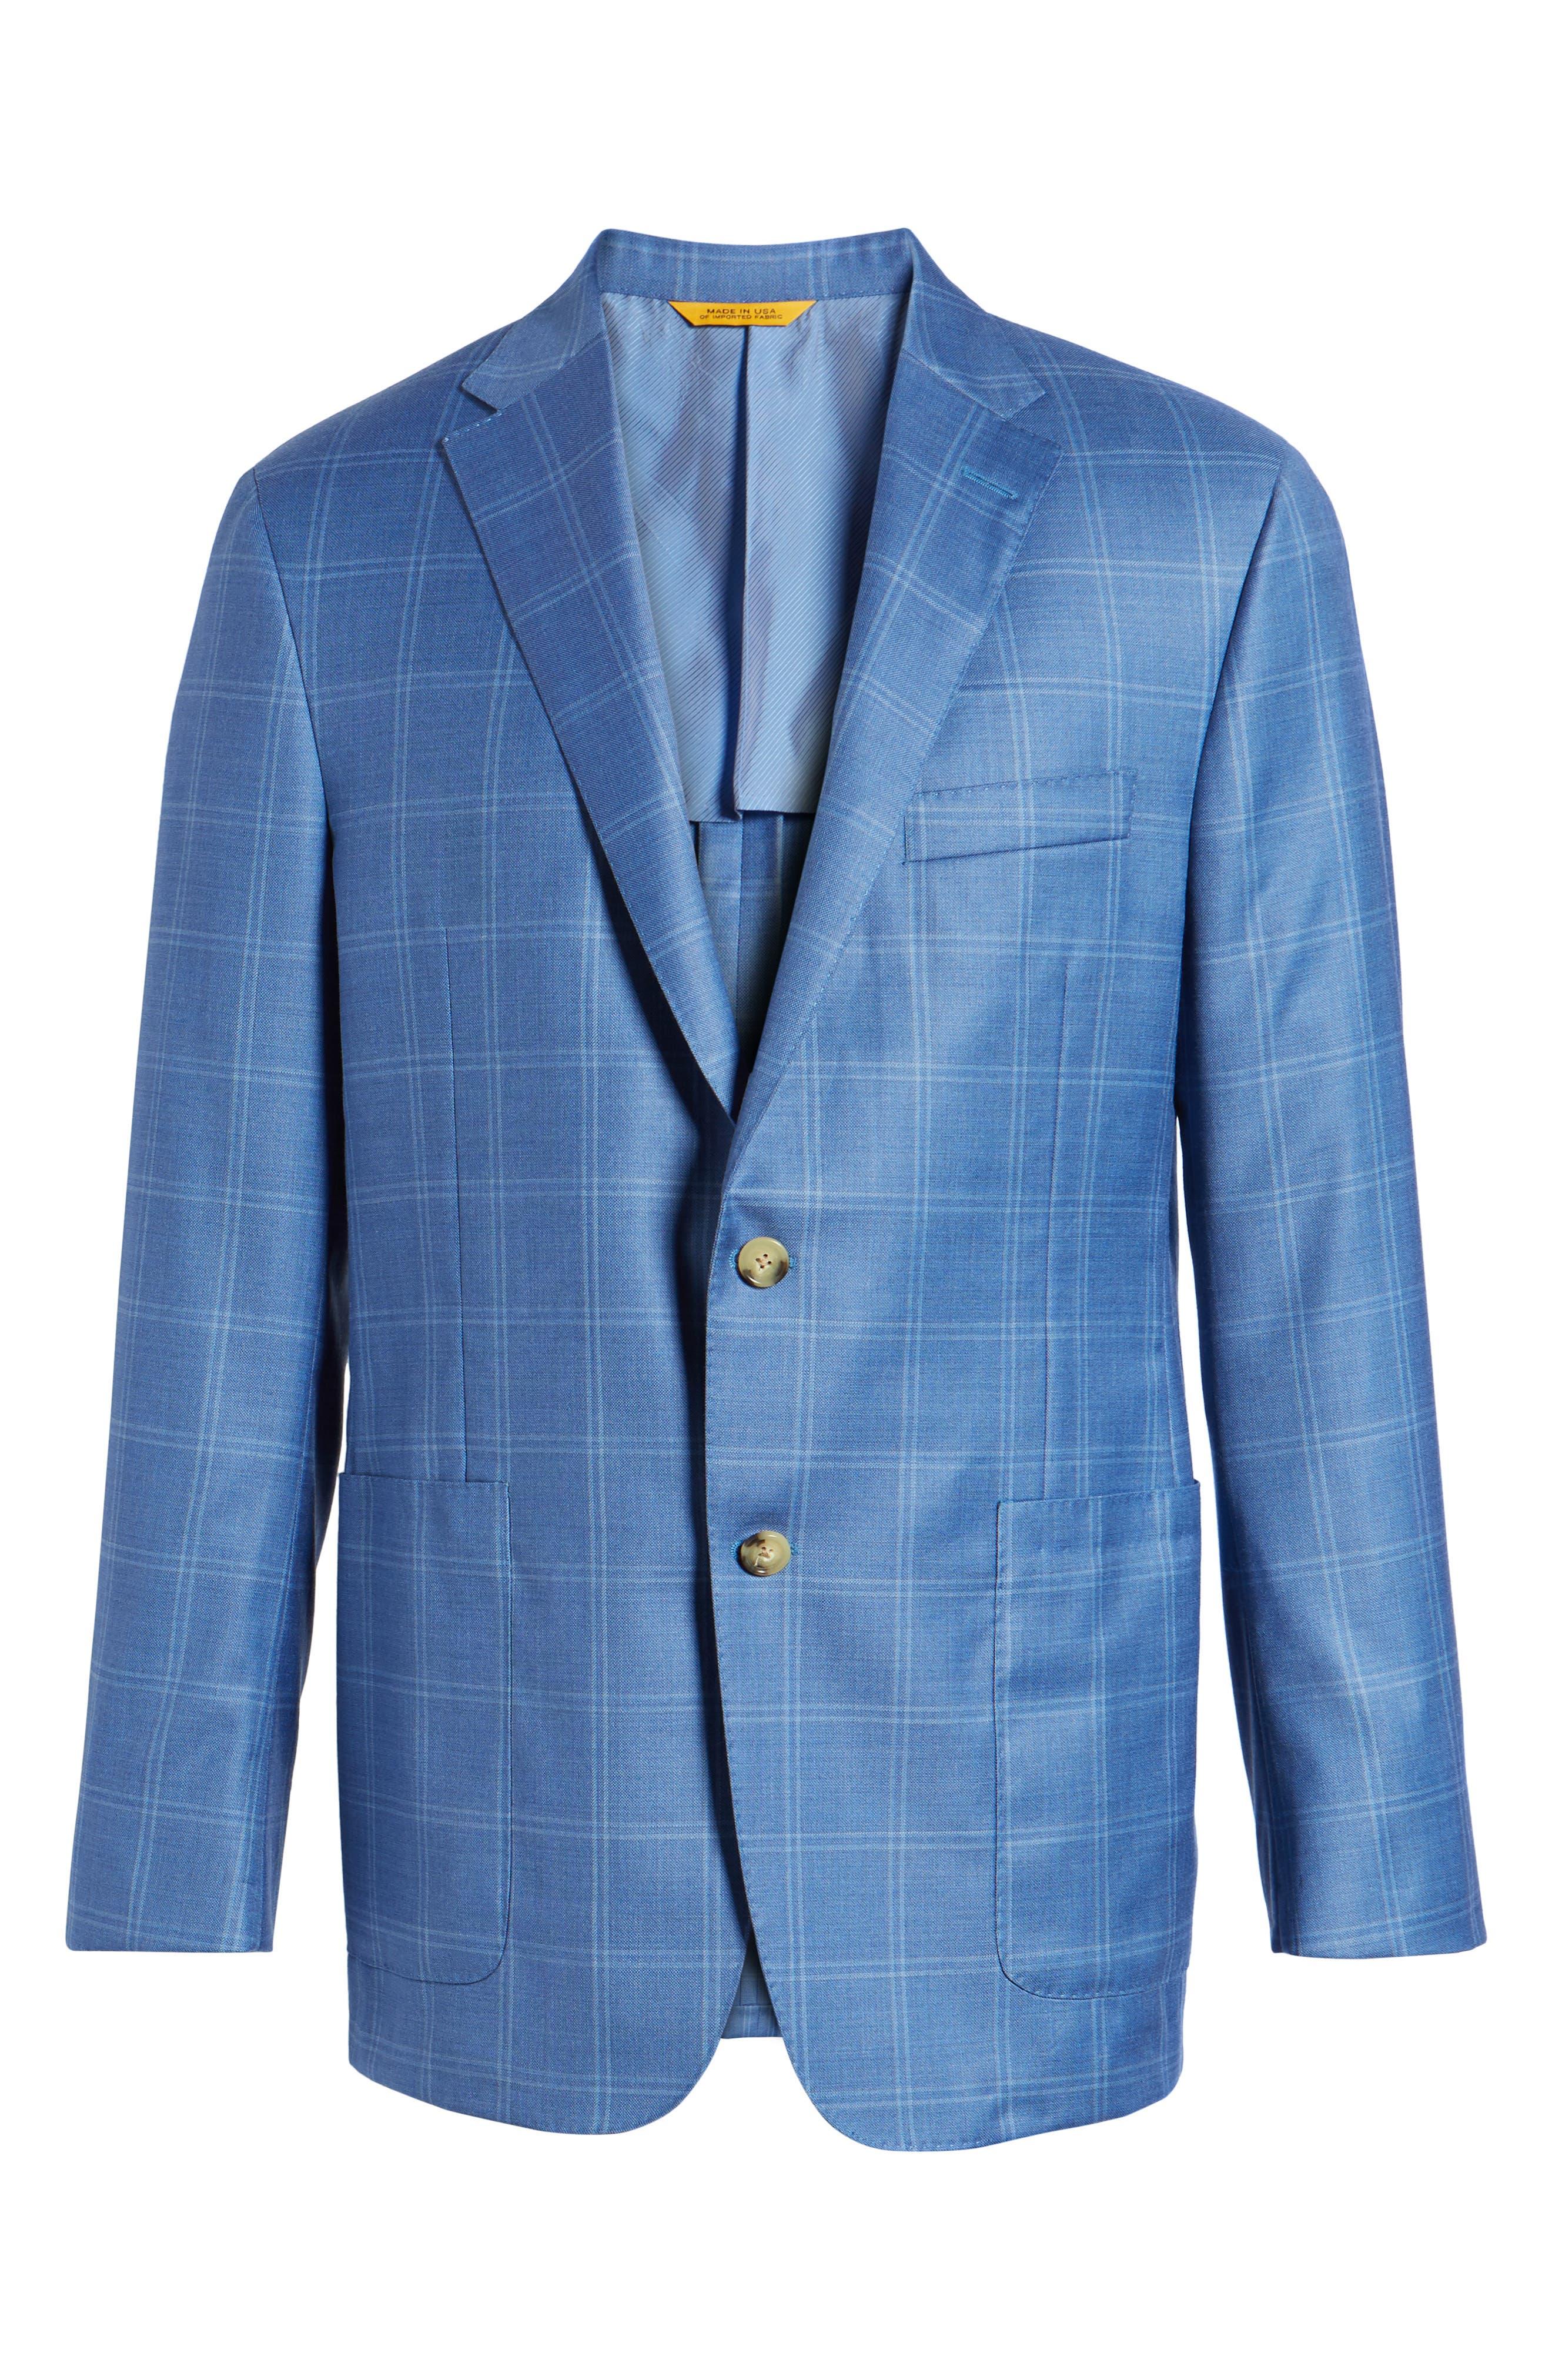 Global Guardian Classic B Fit Windowpane Wool Sport Coat,                             Alternate thumbnail 6, color,                             Light Blue